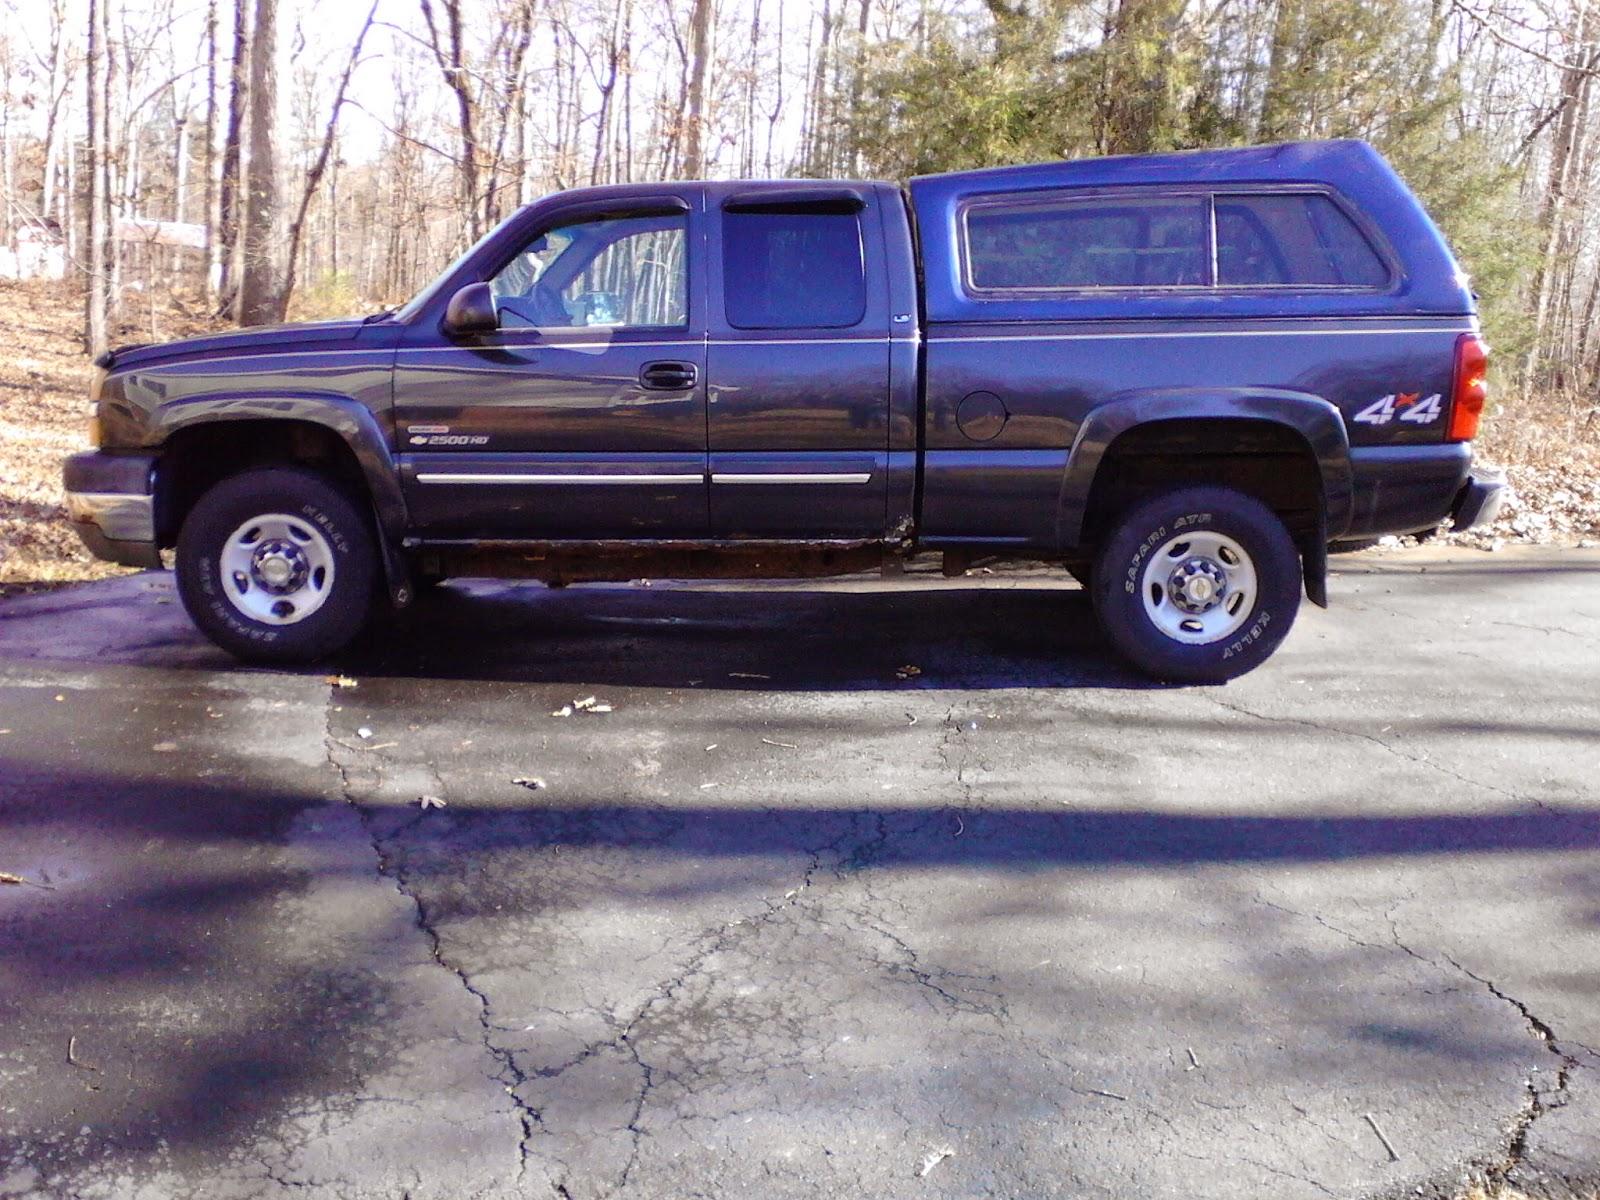 search results miles per gallon for 2500 silverado autos weblog. Black Bedroom Furniture Sets. Home Design Ideas